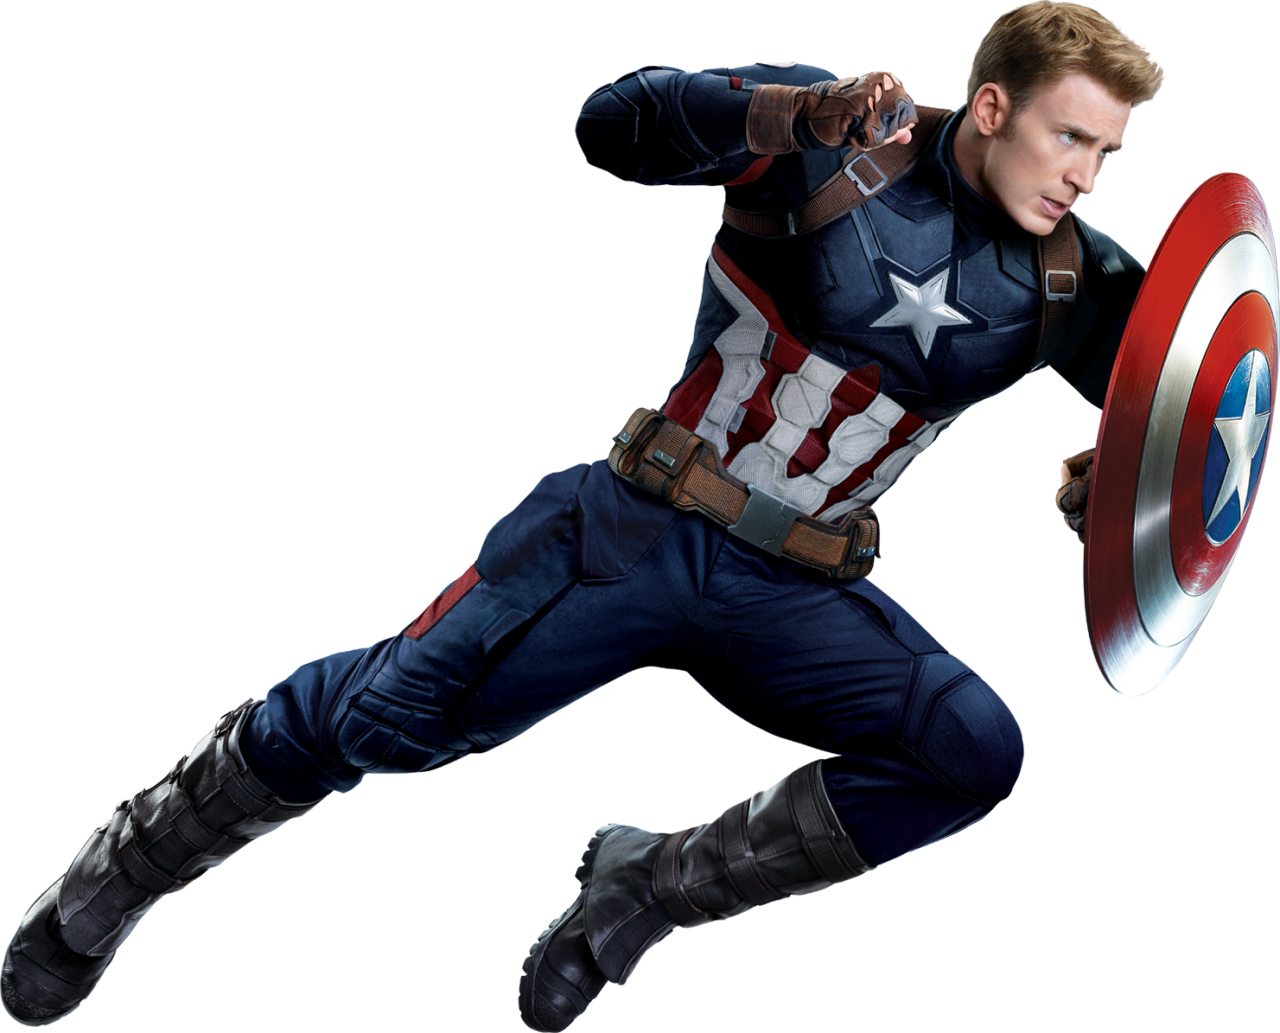 Download Captain America Photo HQ PNG Image   FreePNGImg